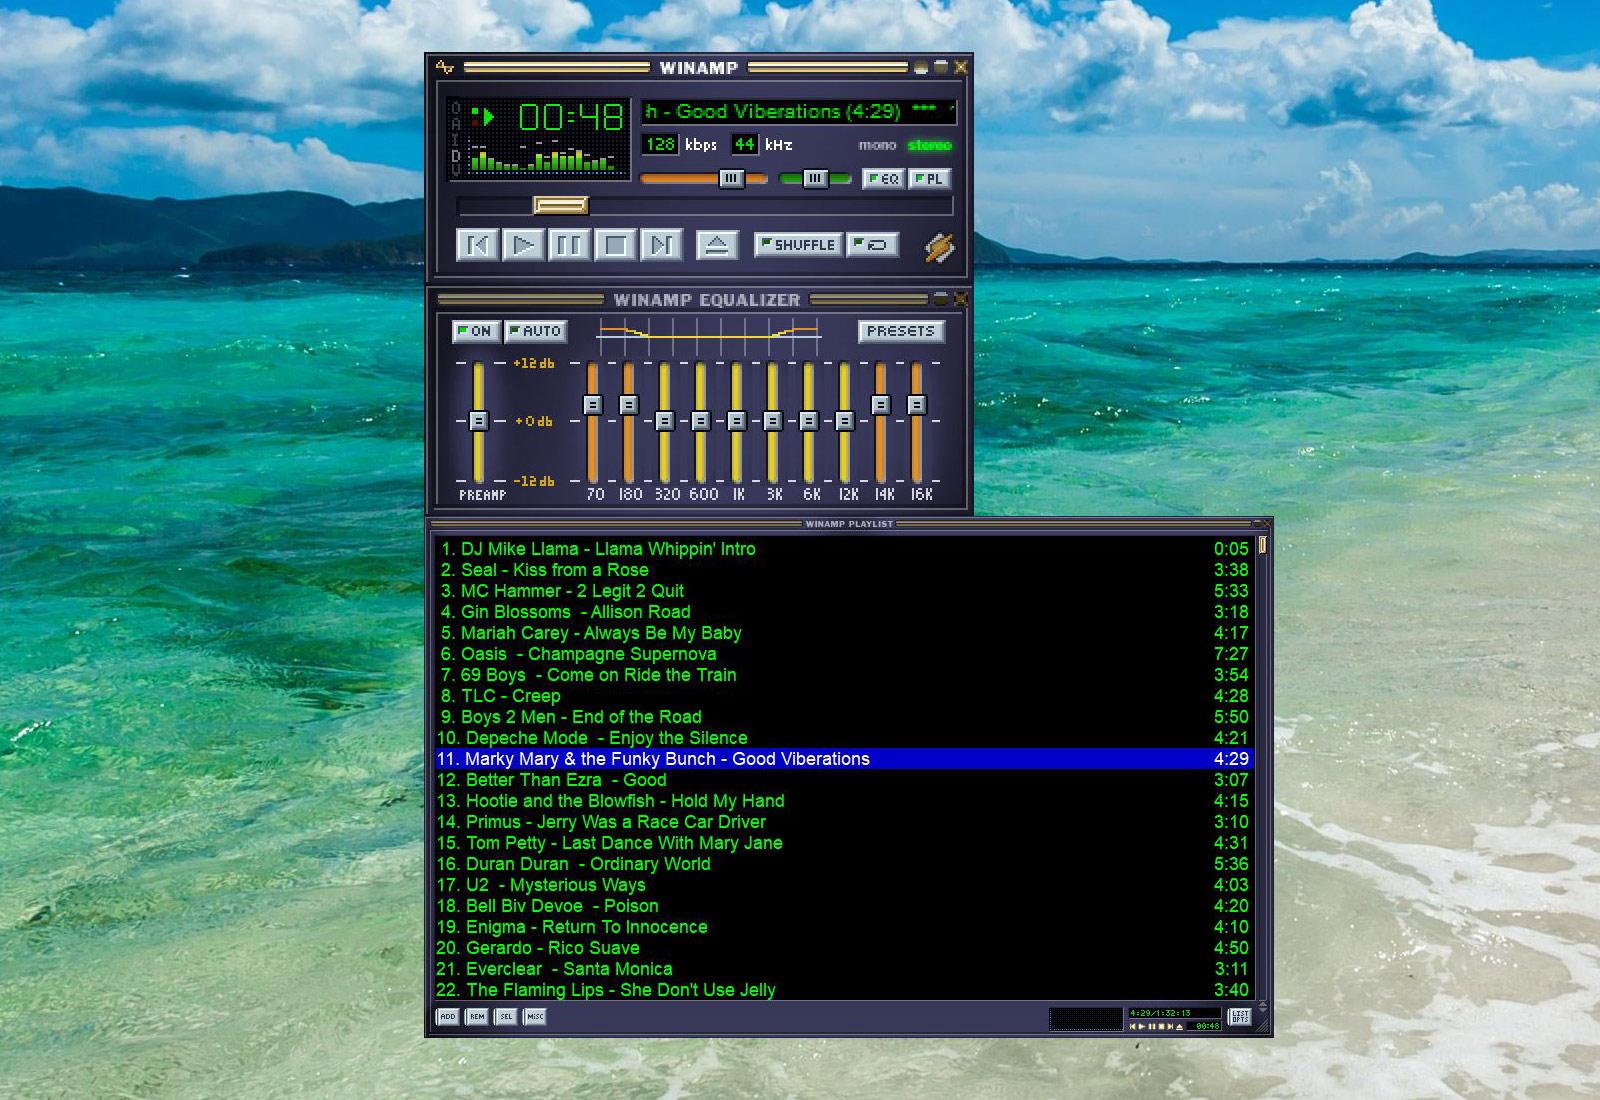 winamp player free download 2010